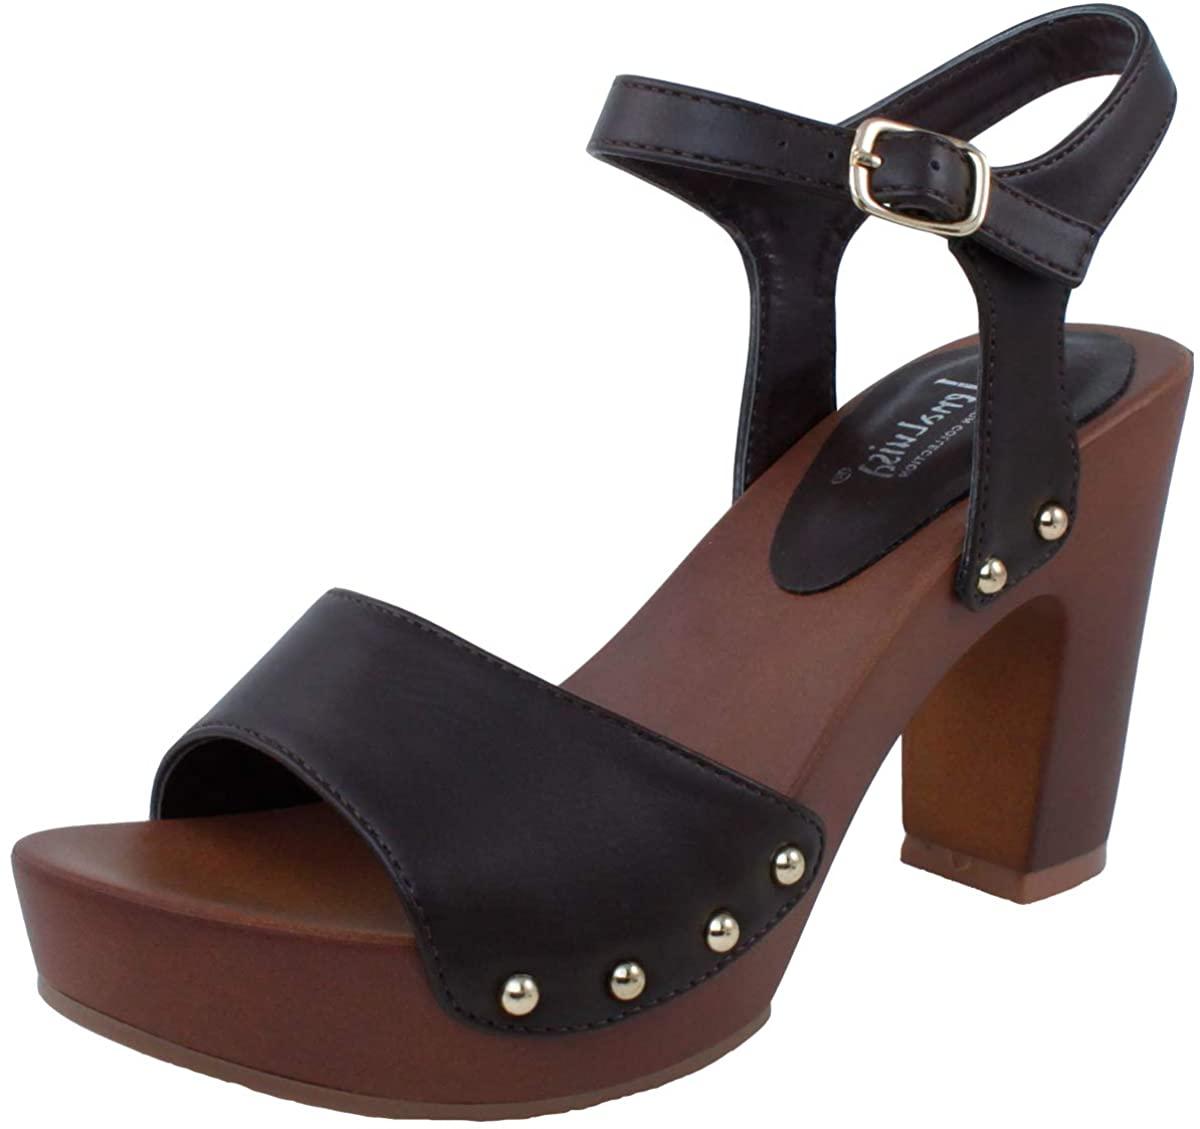 Agape LenaLuisa ABBIE-09 Platform Heel